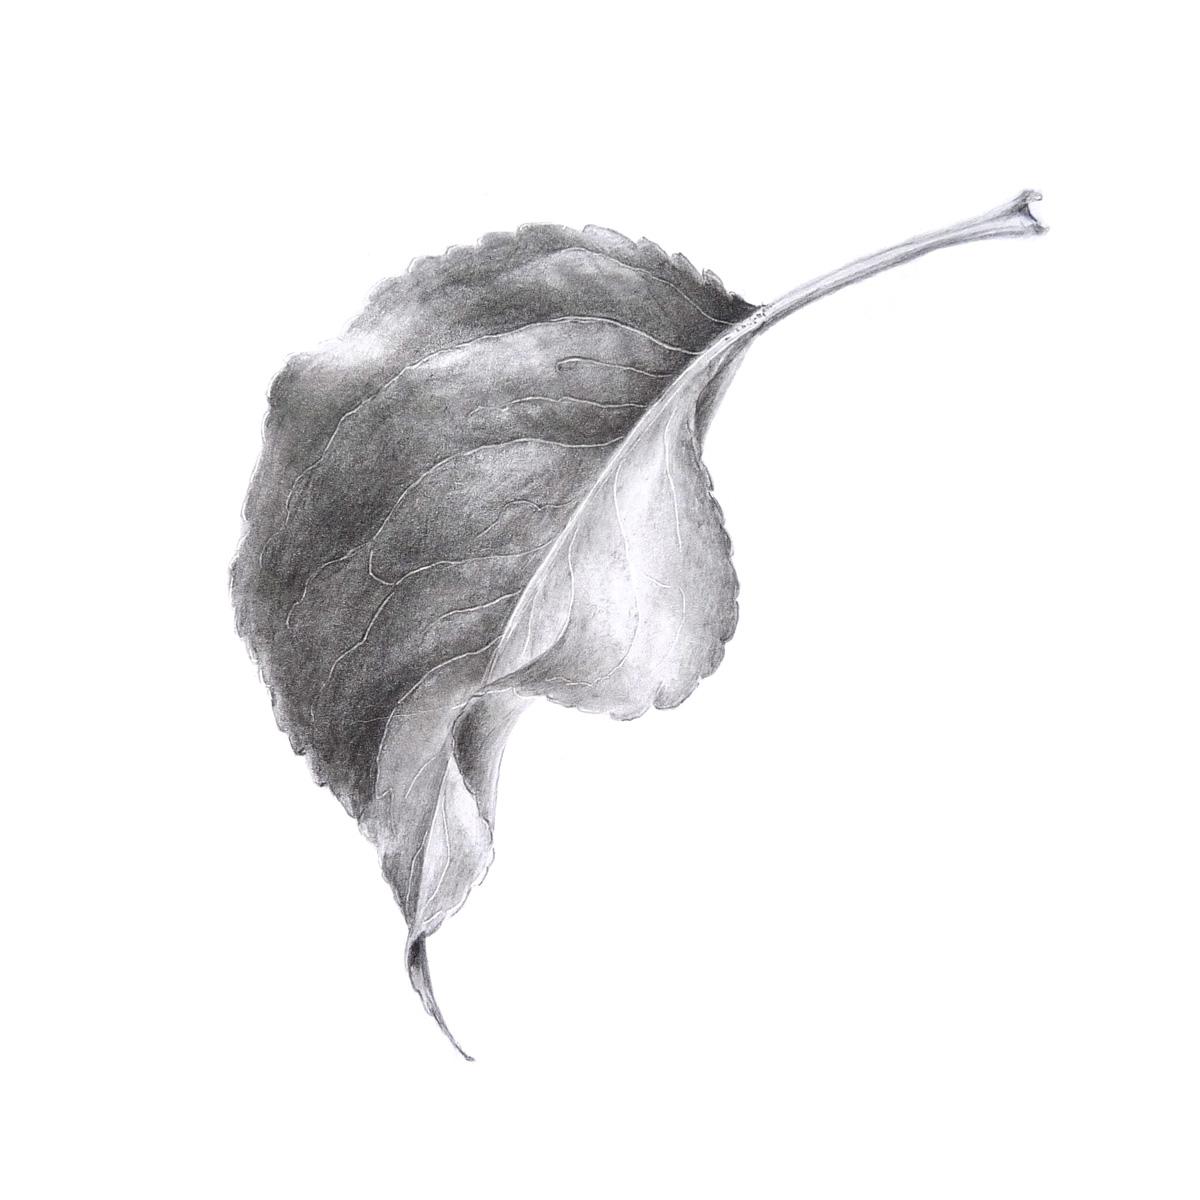 Drawn leaves tonal 2013 Frensen: Sigrid Graphite Monday